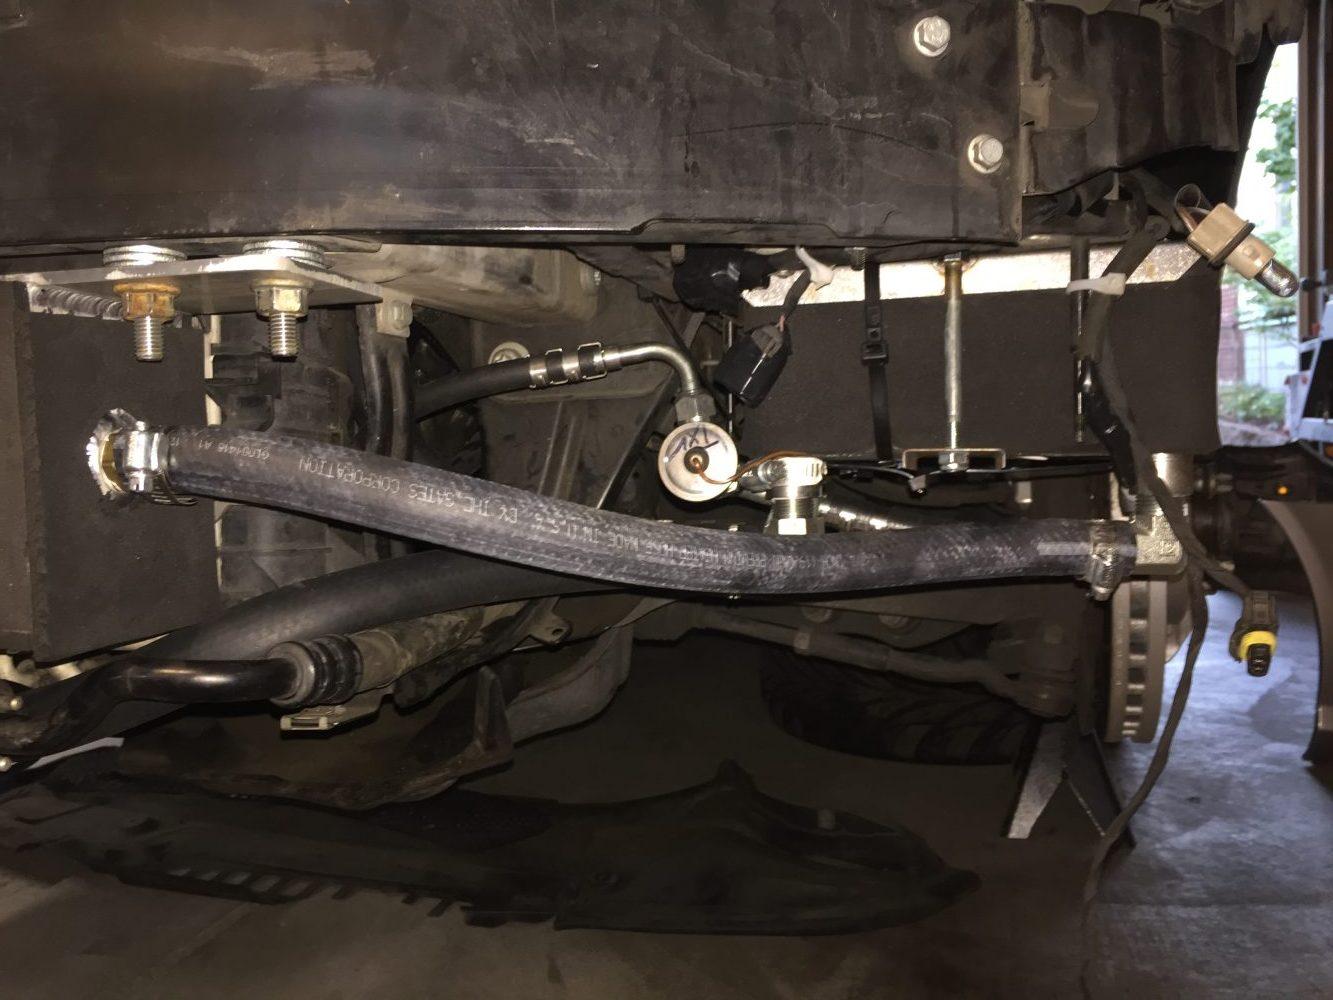 Killer Chiller and Front Mount Tank - Stumptown Benz